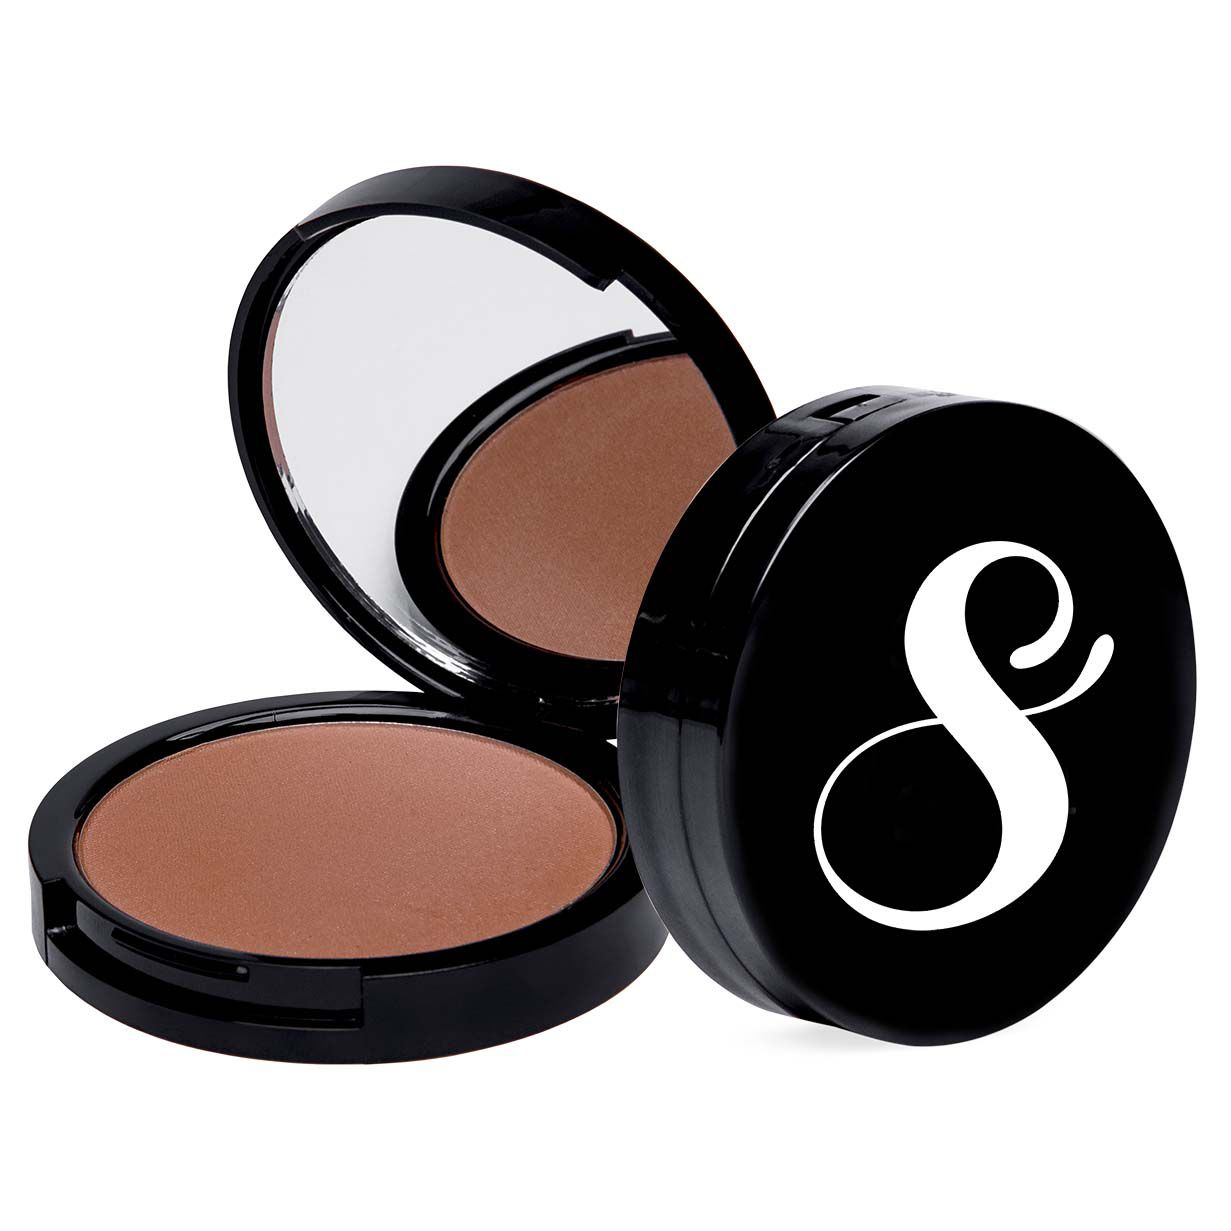 Pó Compacto Suelen Makeup Dion  - SUELEN MAKEUP